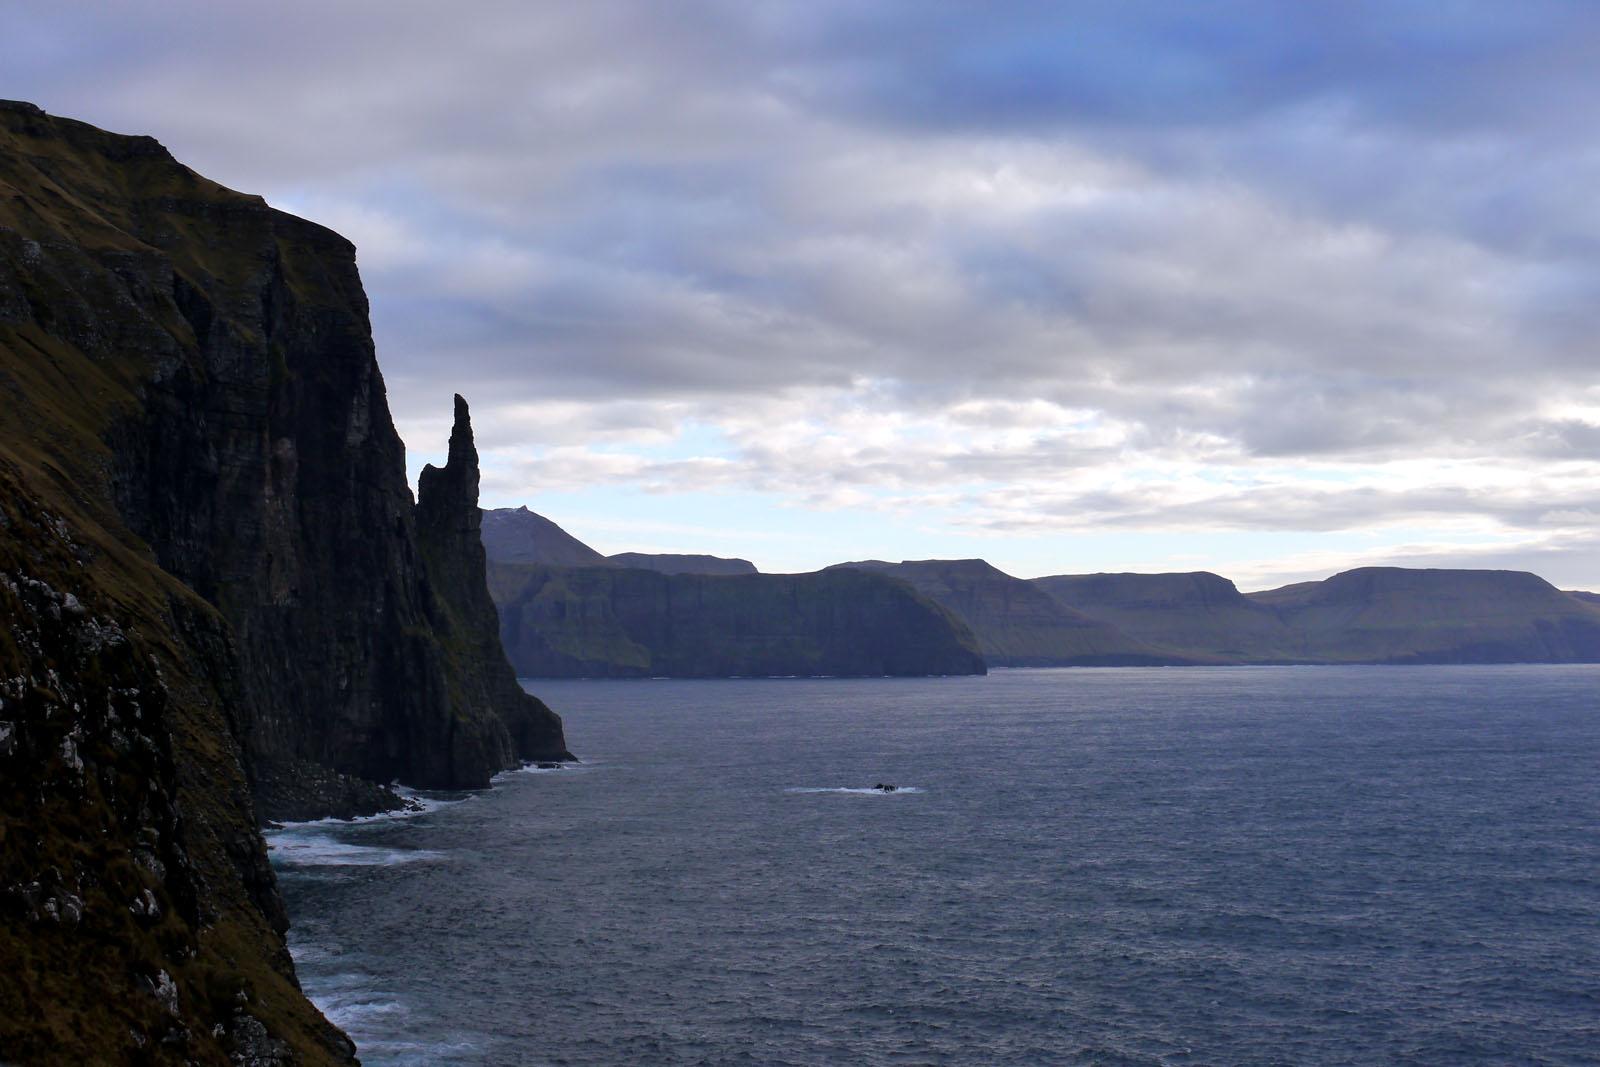 Vagar-Faroer Inseln- Trollkonifingur-Klippen-Atlantik-Wandern